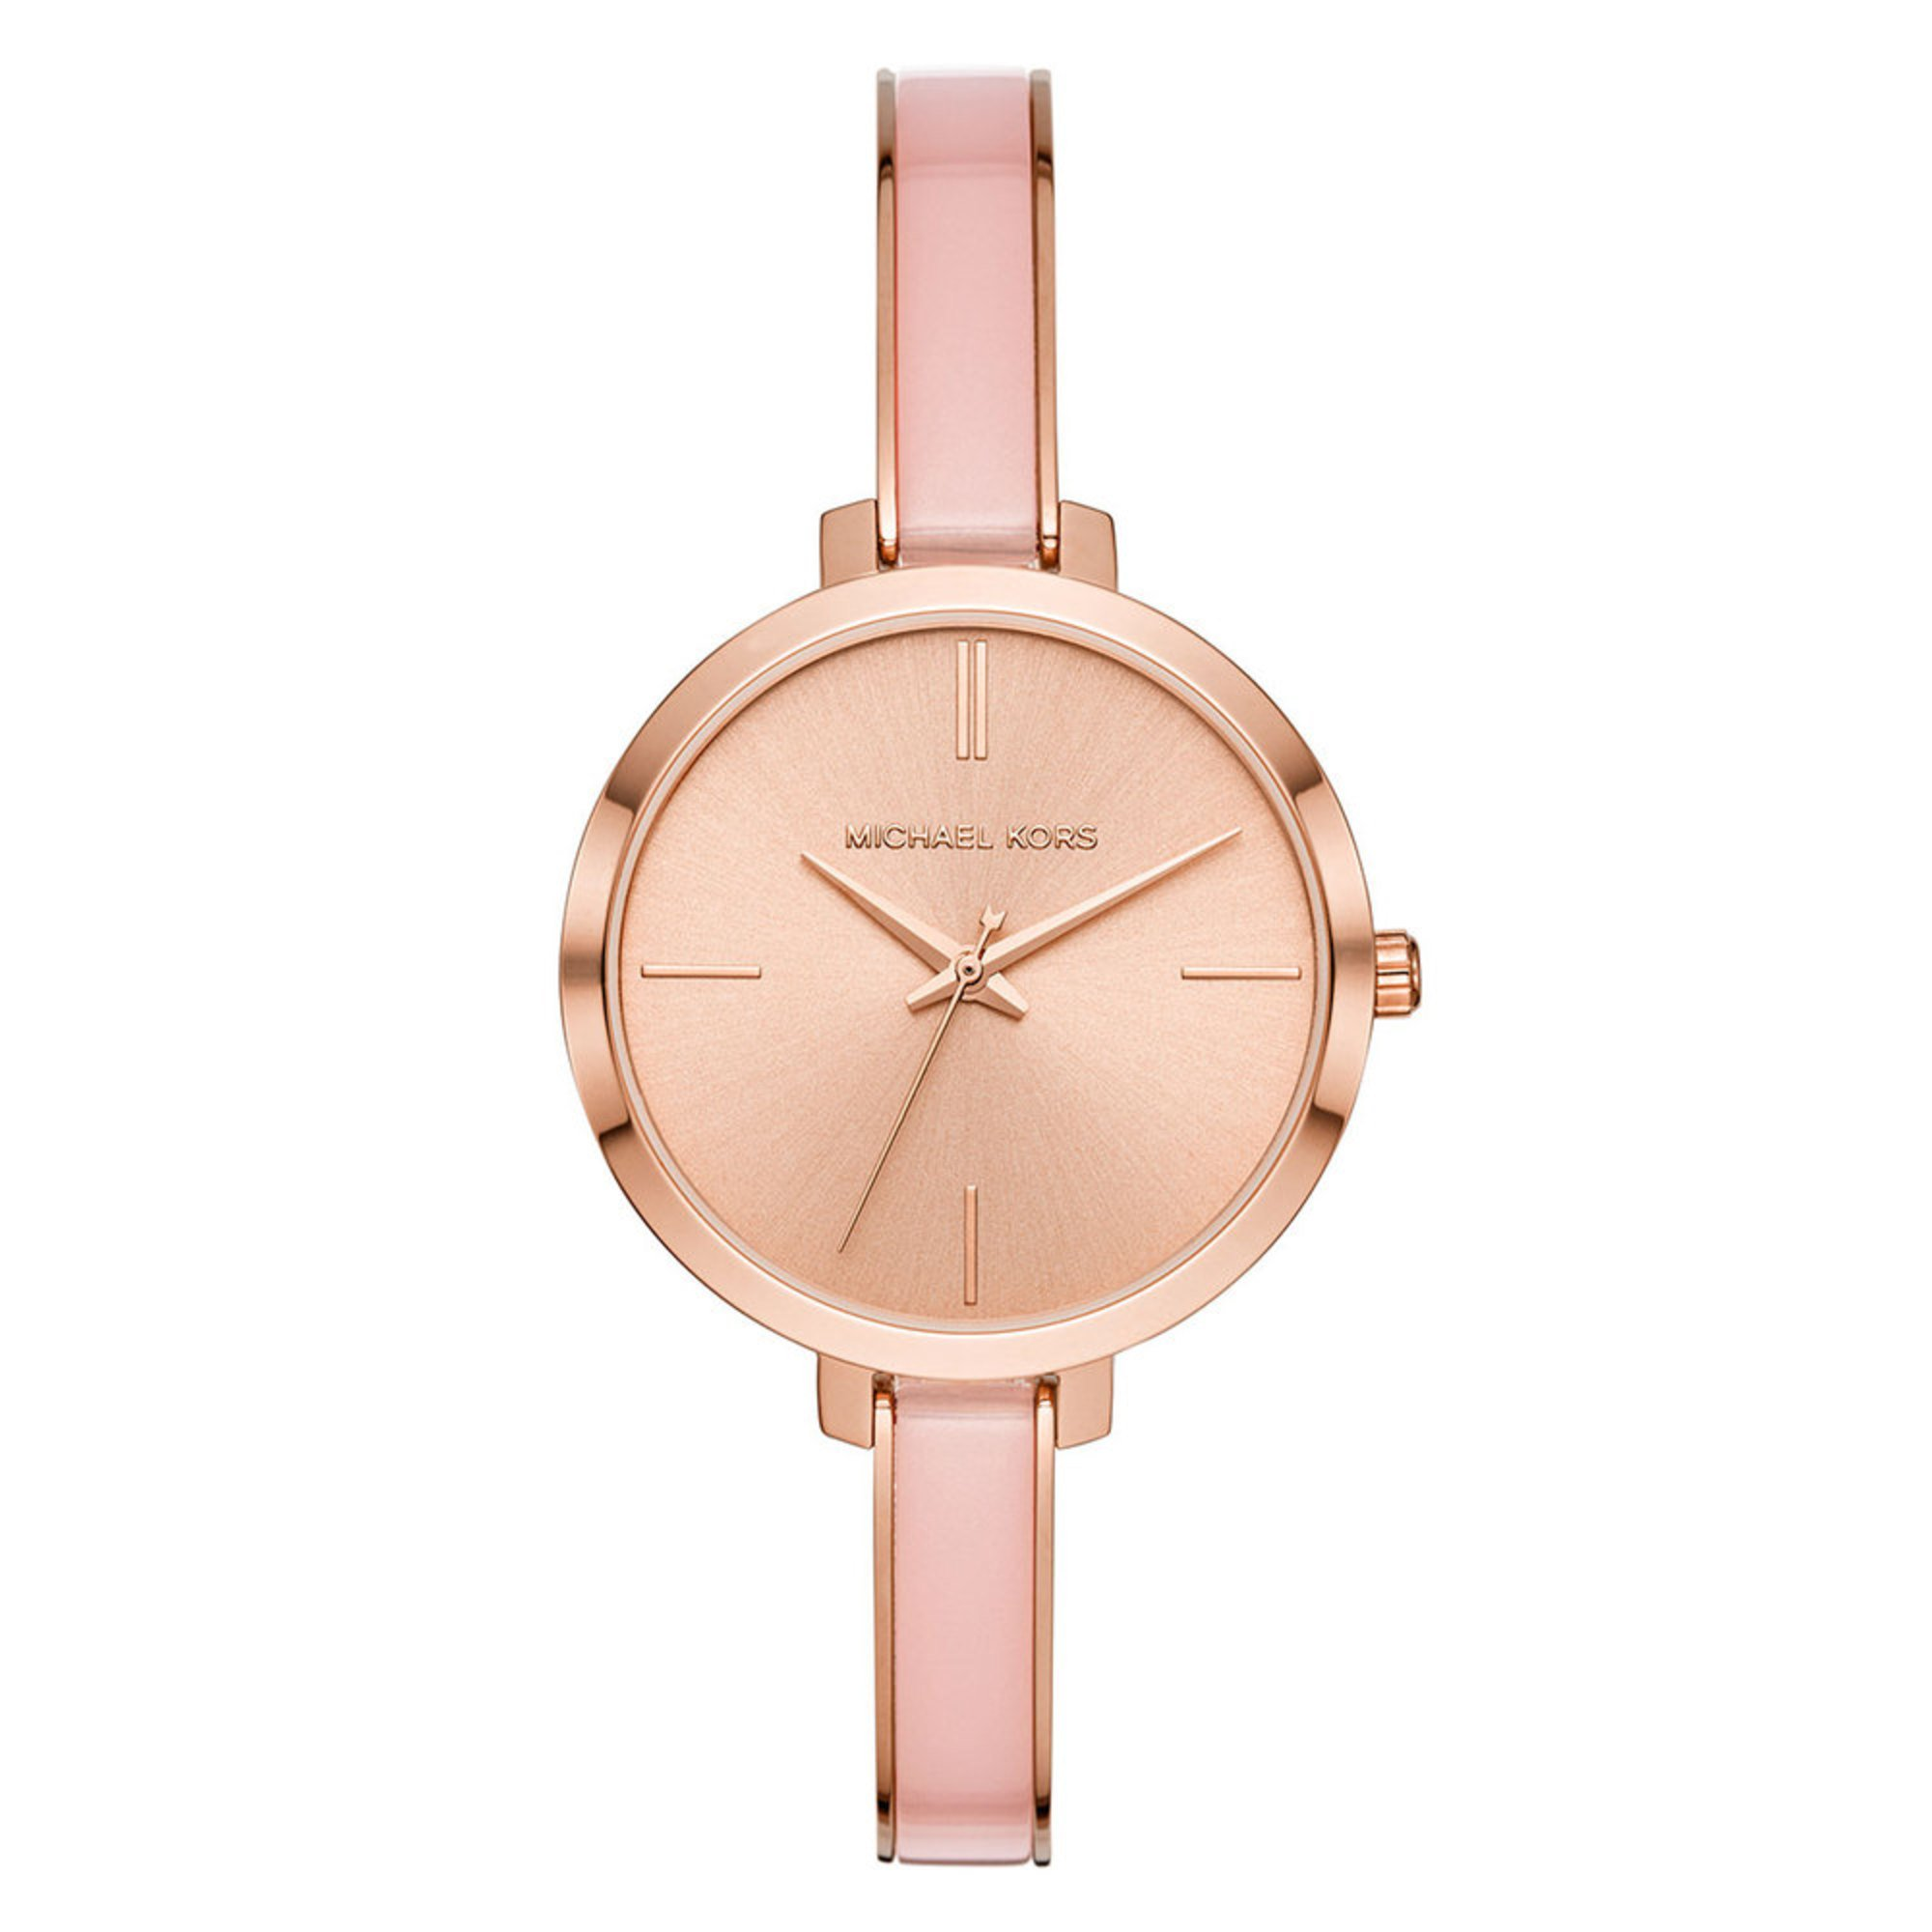 8125e20f41cd Michael Kors Women s Jaryn Pink Bangle Watch